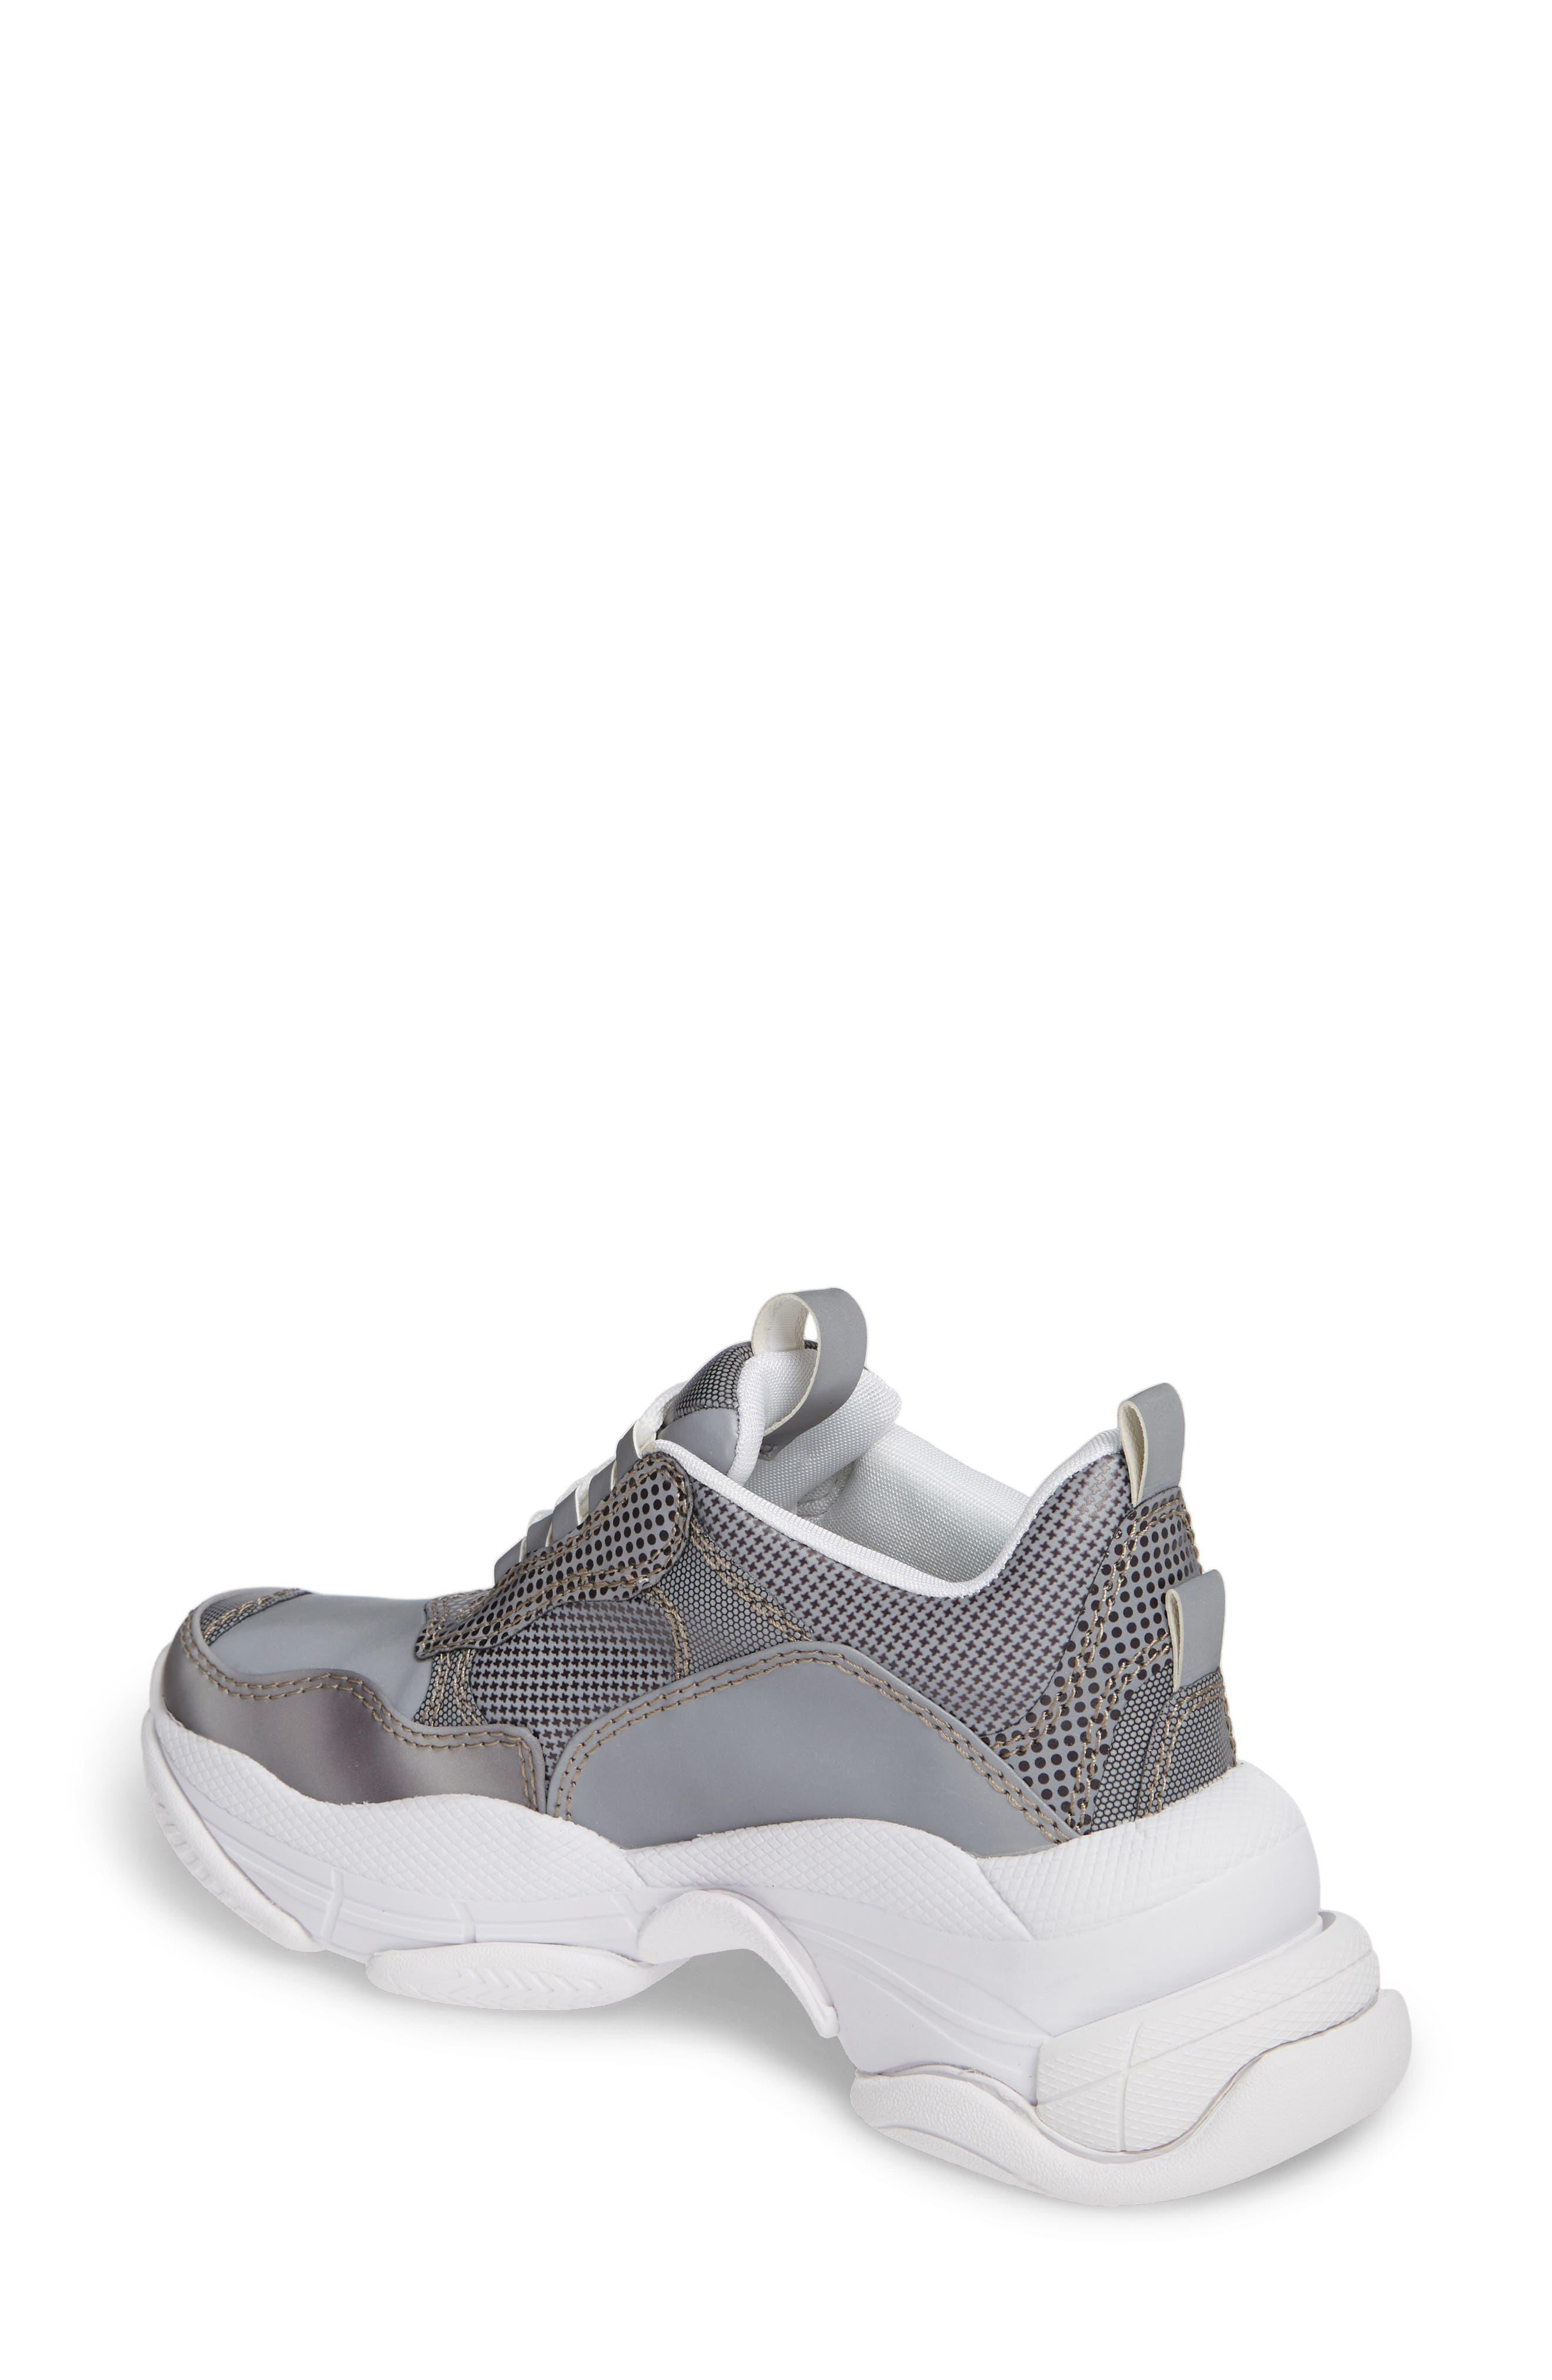 Lo-Fi Sneaker,                             Alternate thumbnail 2, color,                             020